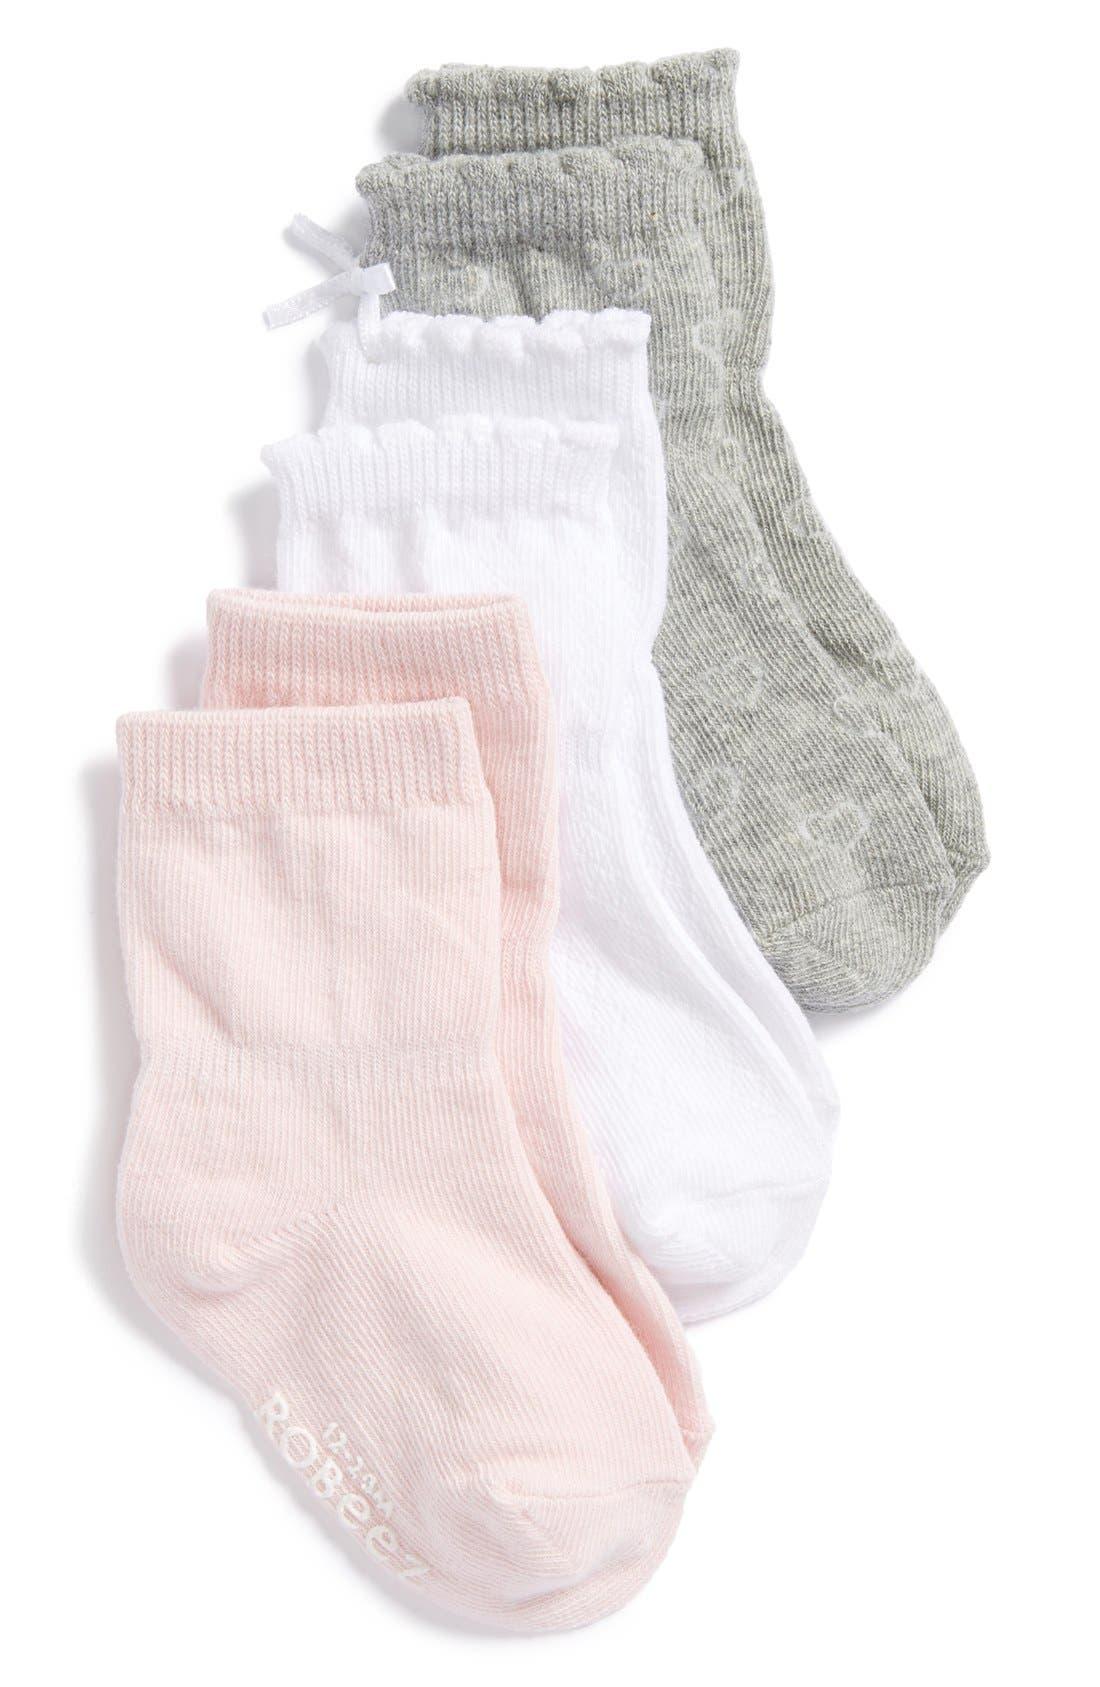 Kickproof Ankle Socks,                             Main thumbnail 1, color,                             650